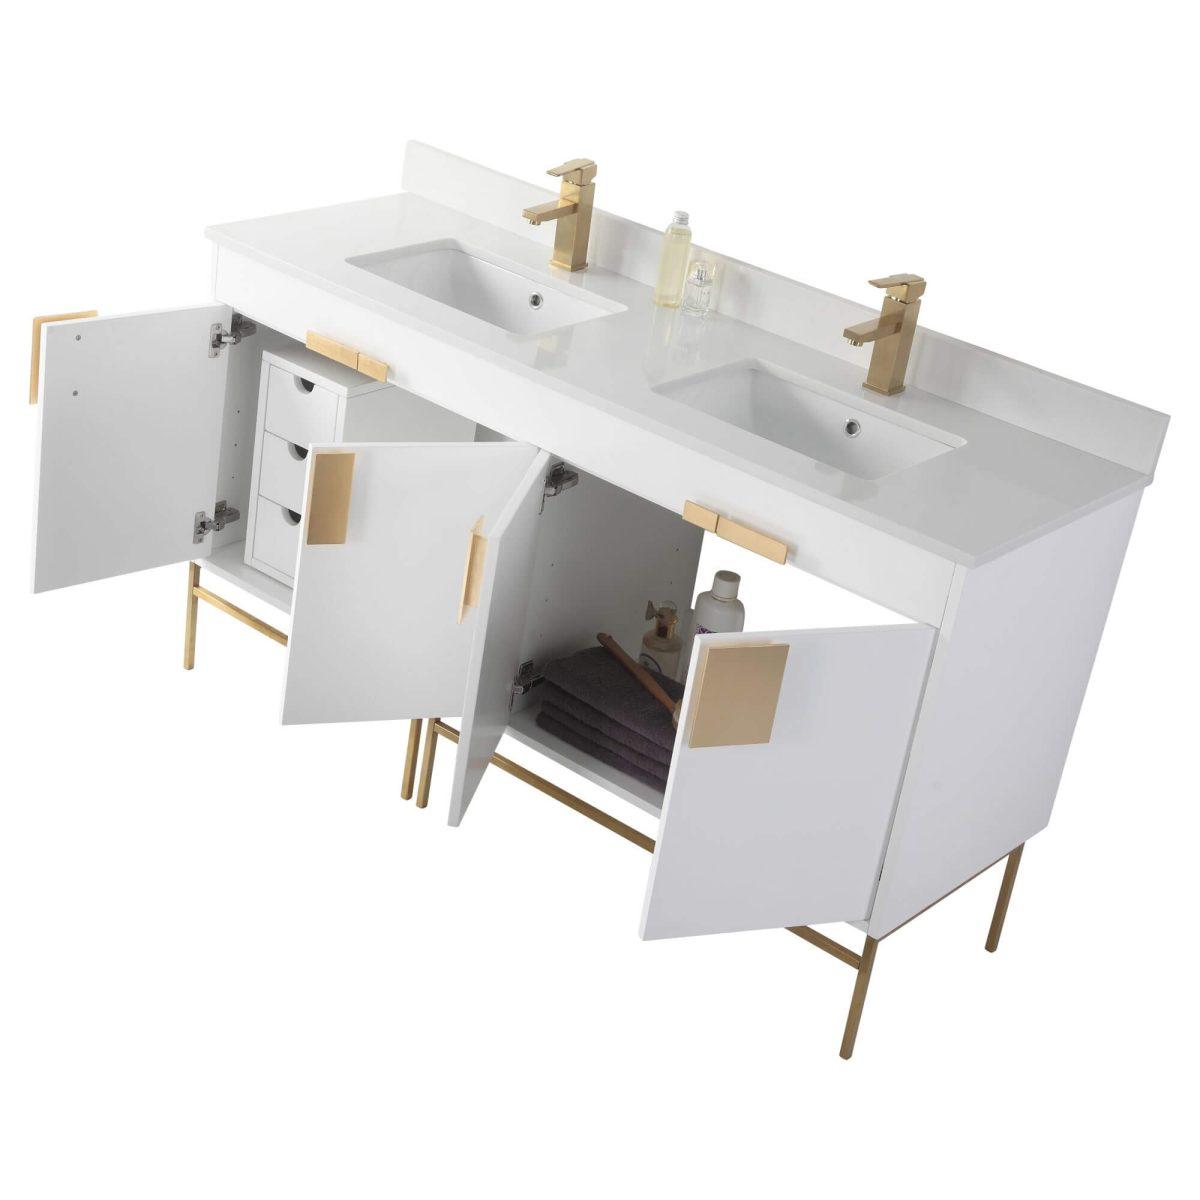 "Shawbridge 60"" Modern Double Bathroom Vanity  White with Satin Brass Hardware"